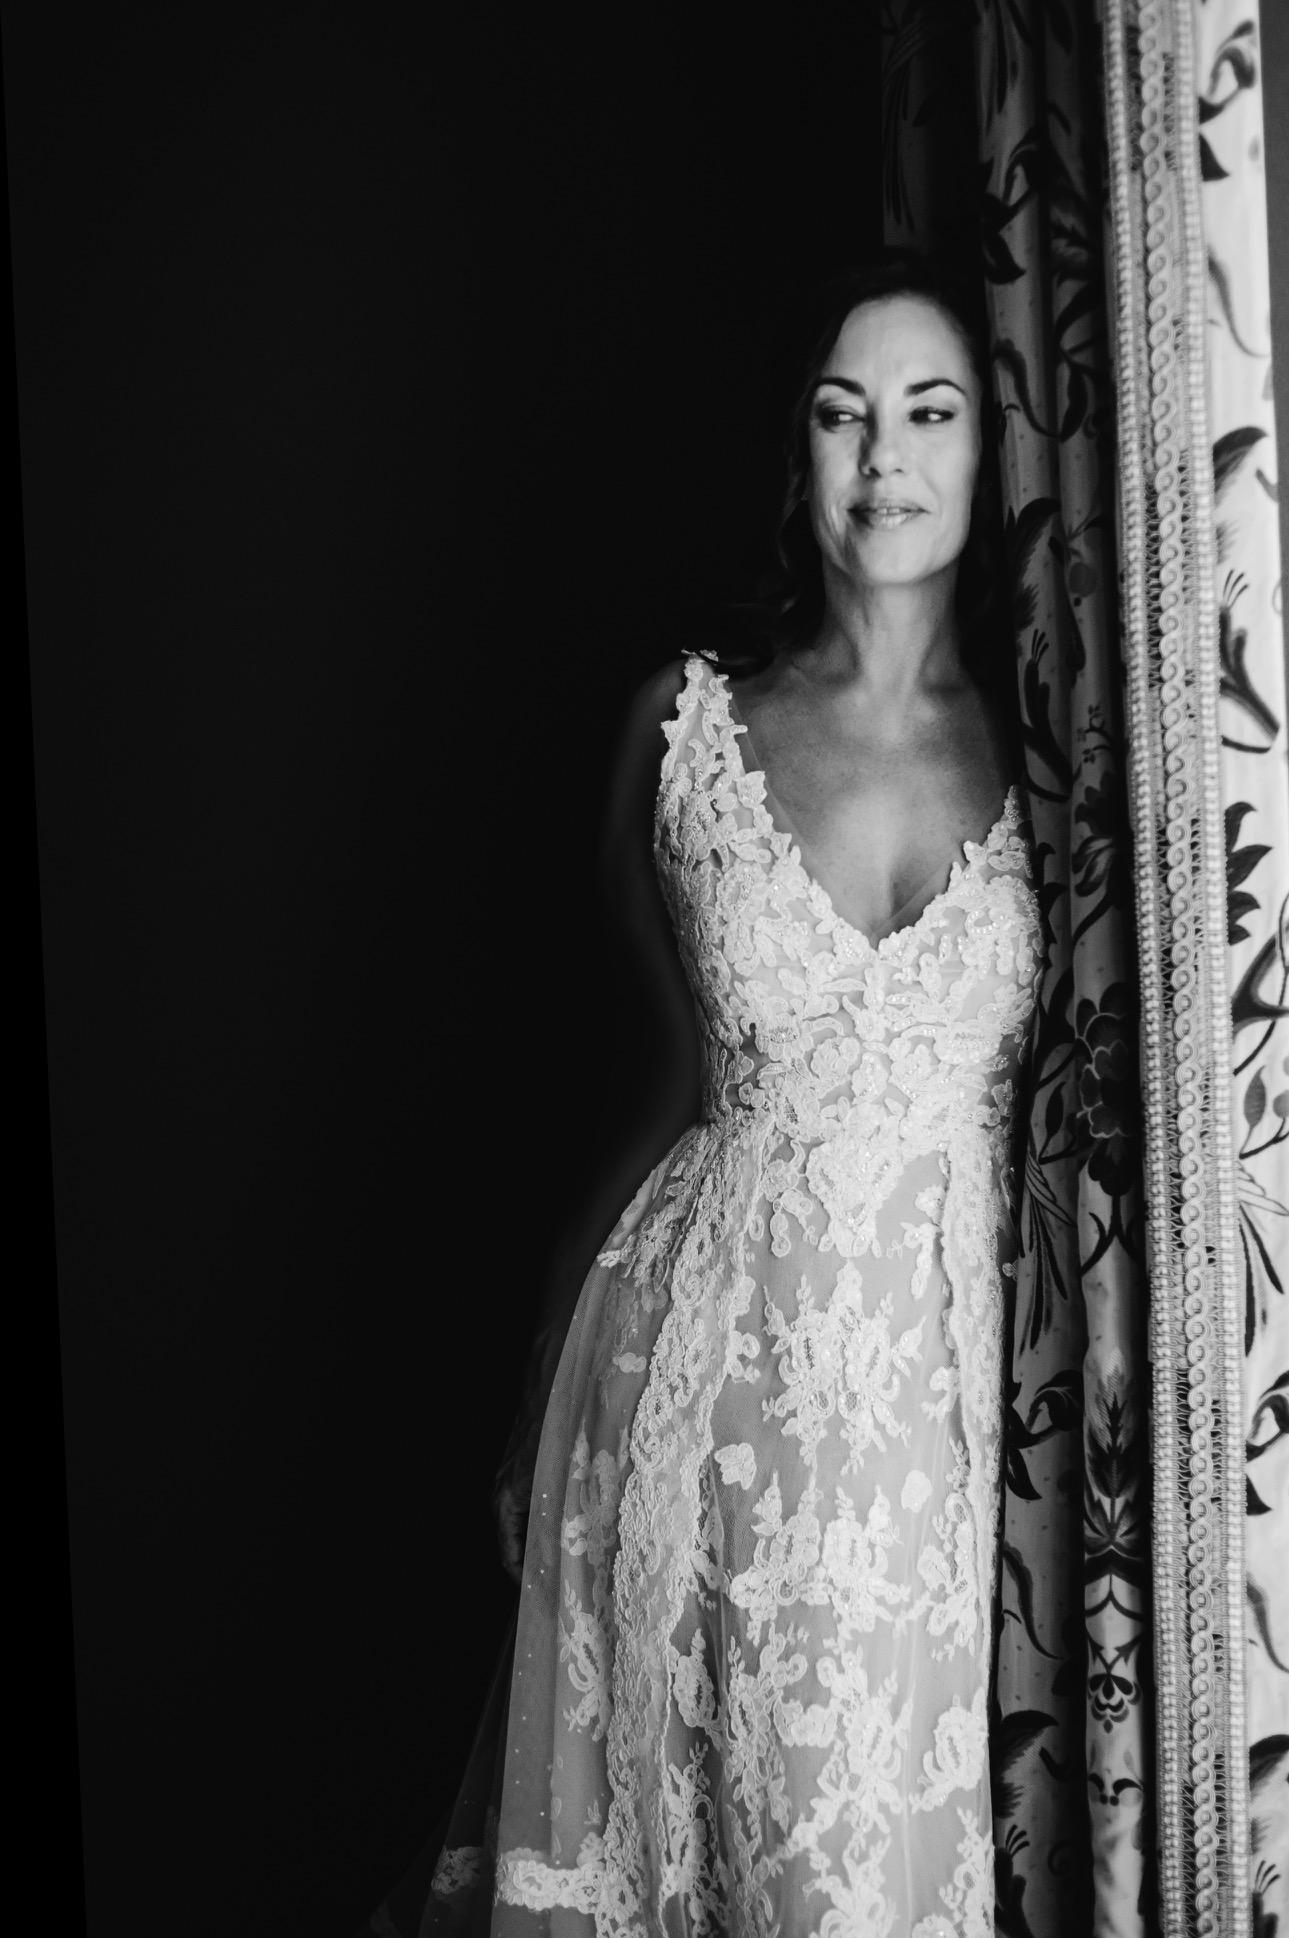 Si-Quiero-Wedding-Planner-By-Sira-Antequera-Bodas-Málaga-Marbella-Miami- Michelle-Walter-4